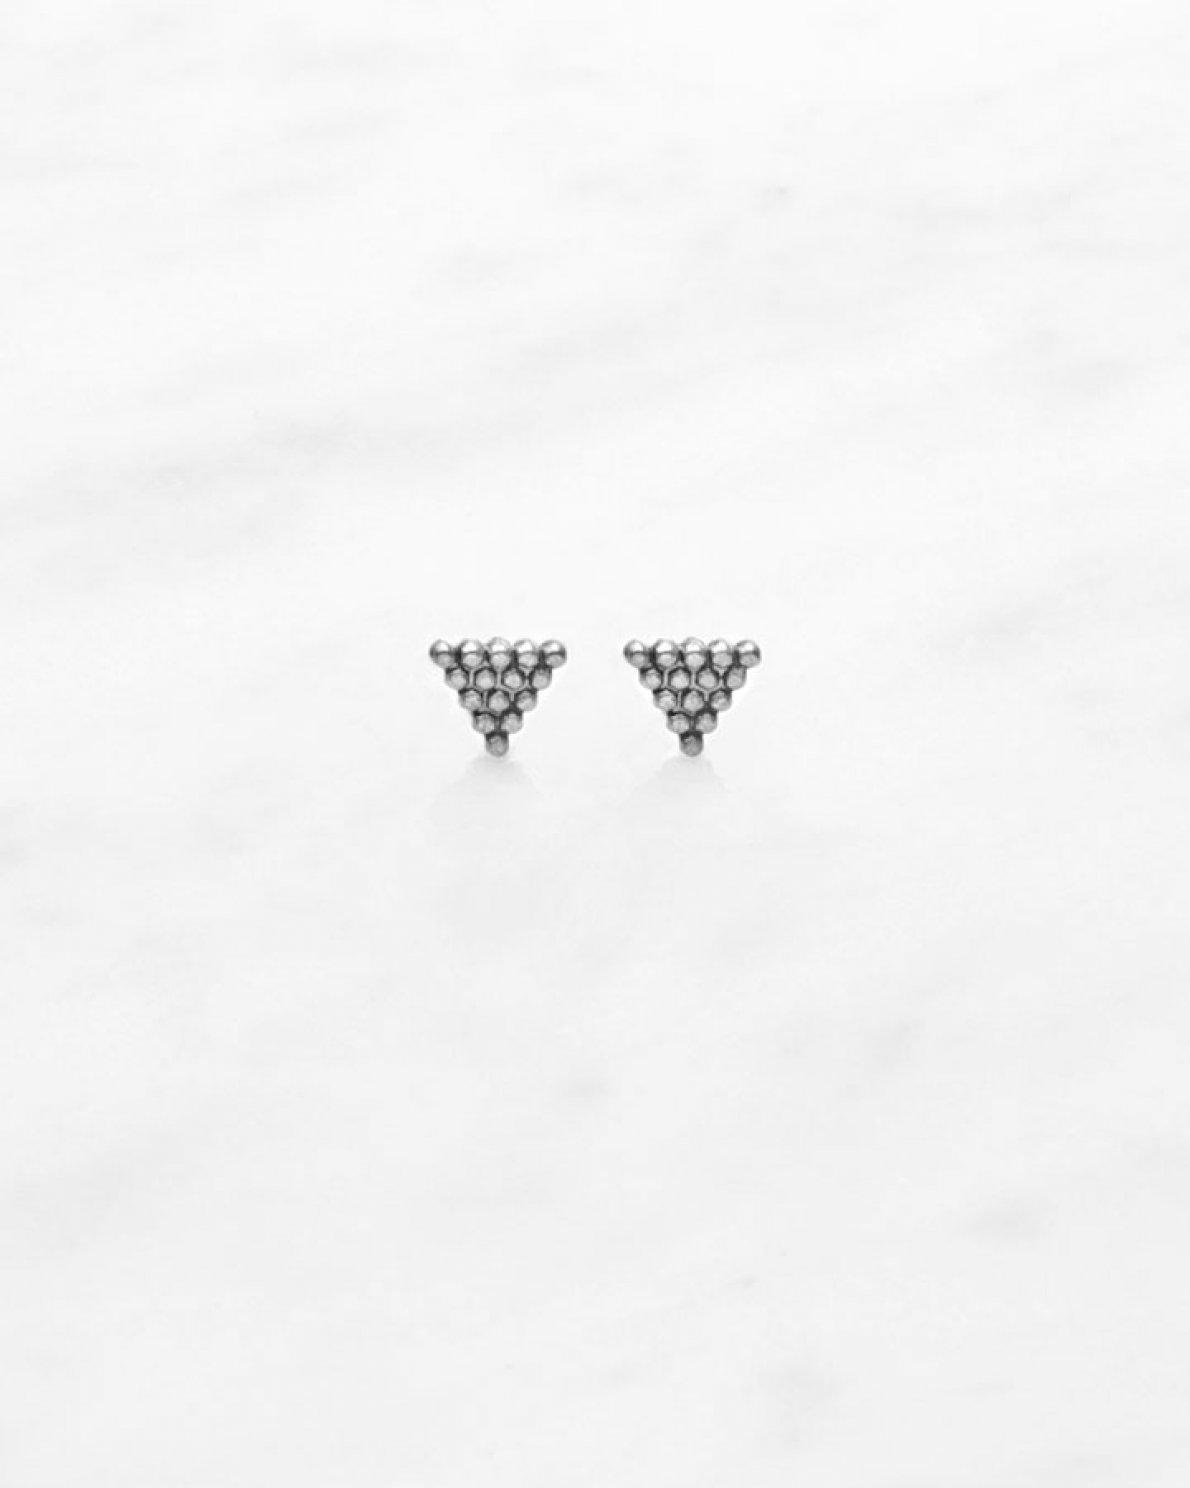 Tidssvarende OUTLET Jewellery - Moss Copenhagen - Toscana YK-31